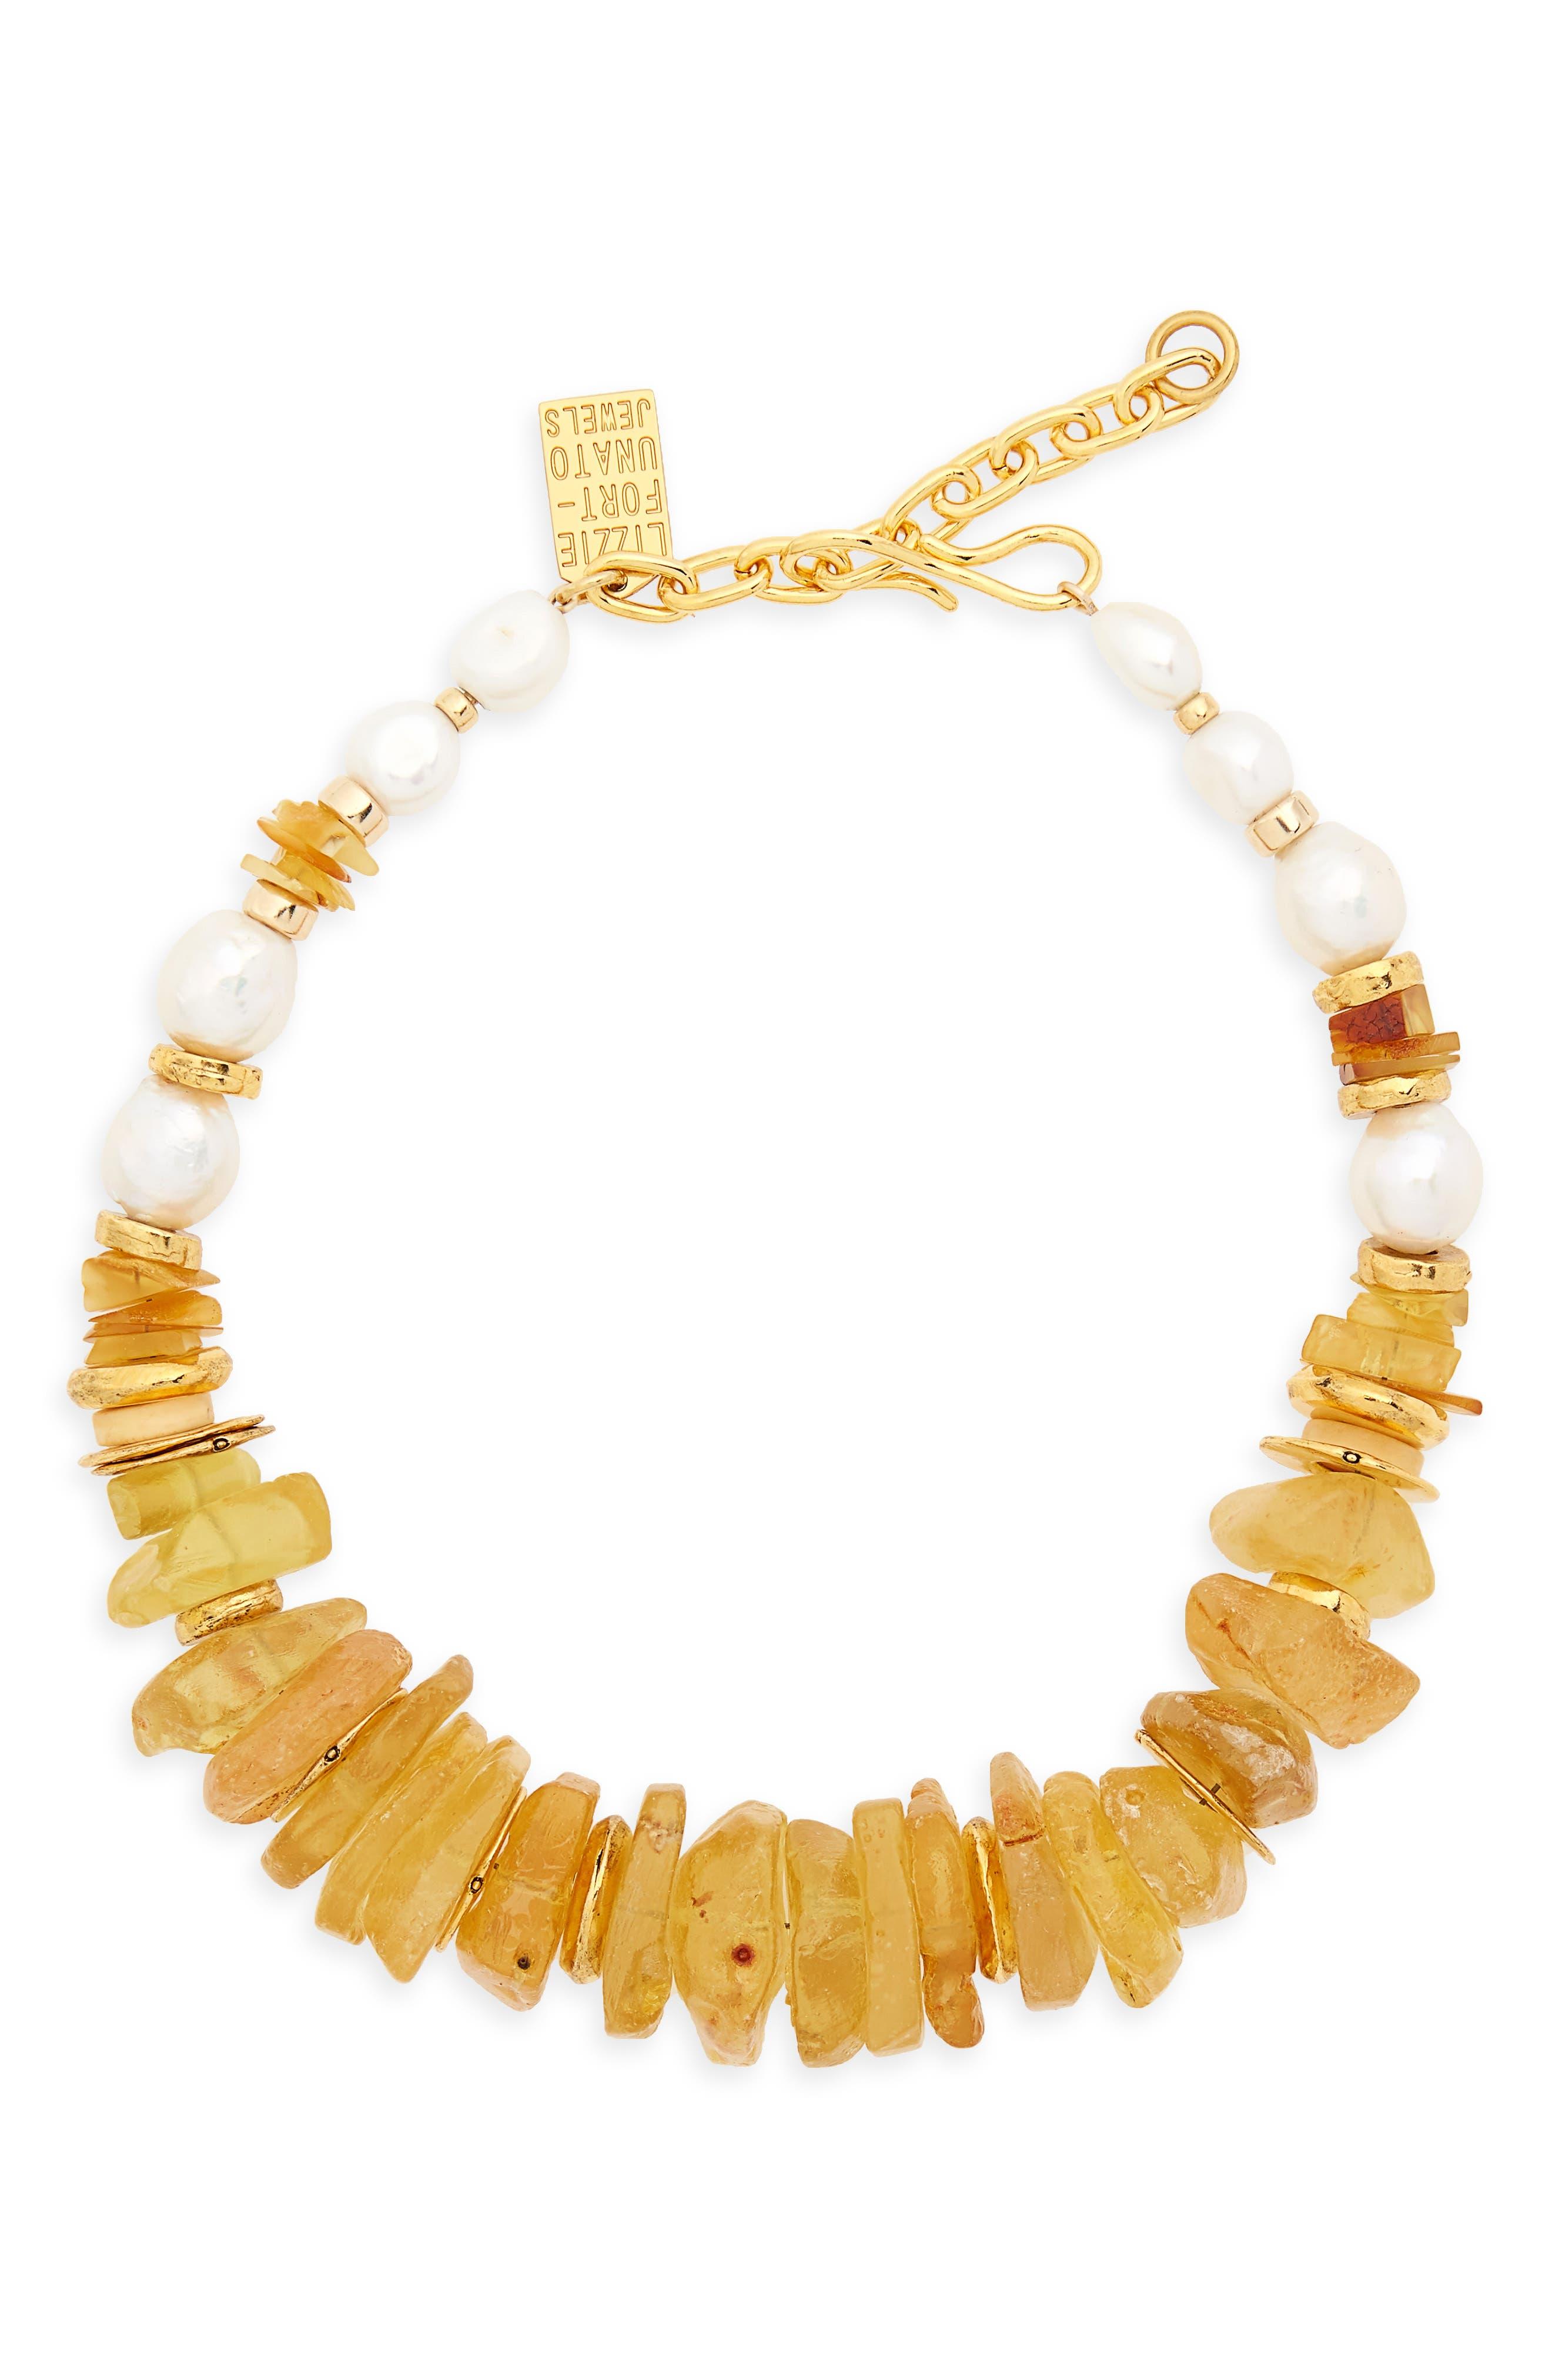 Main Image - Lizzie Fortunato Collar Necklace